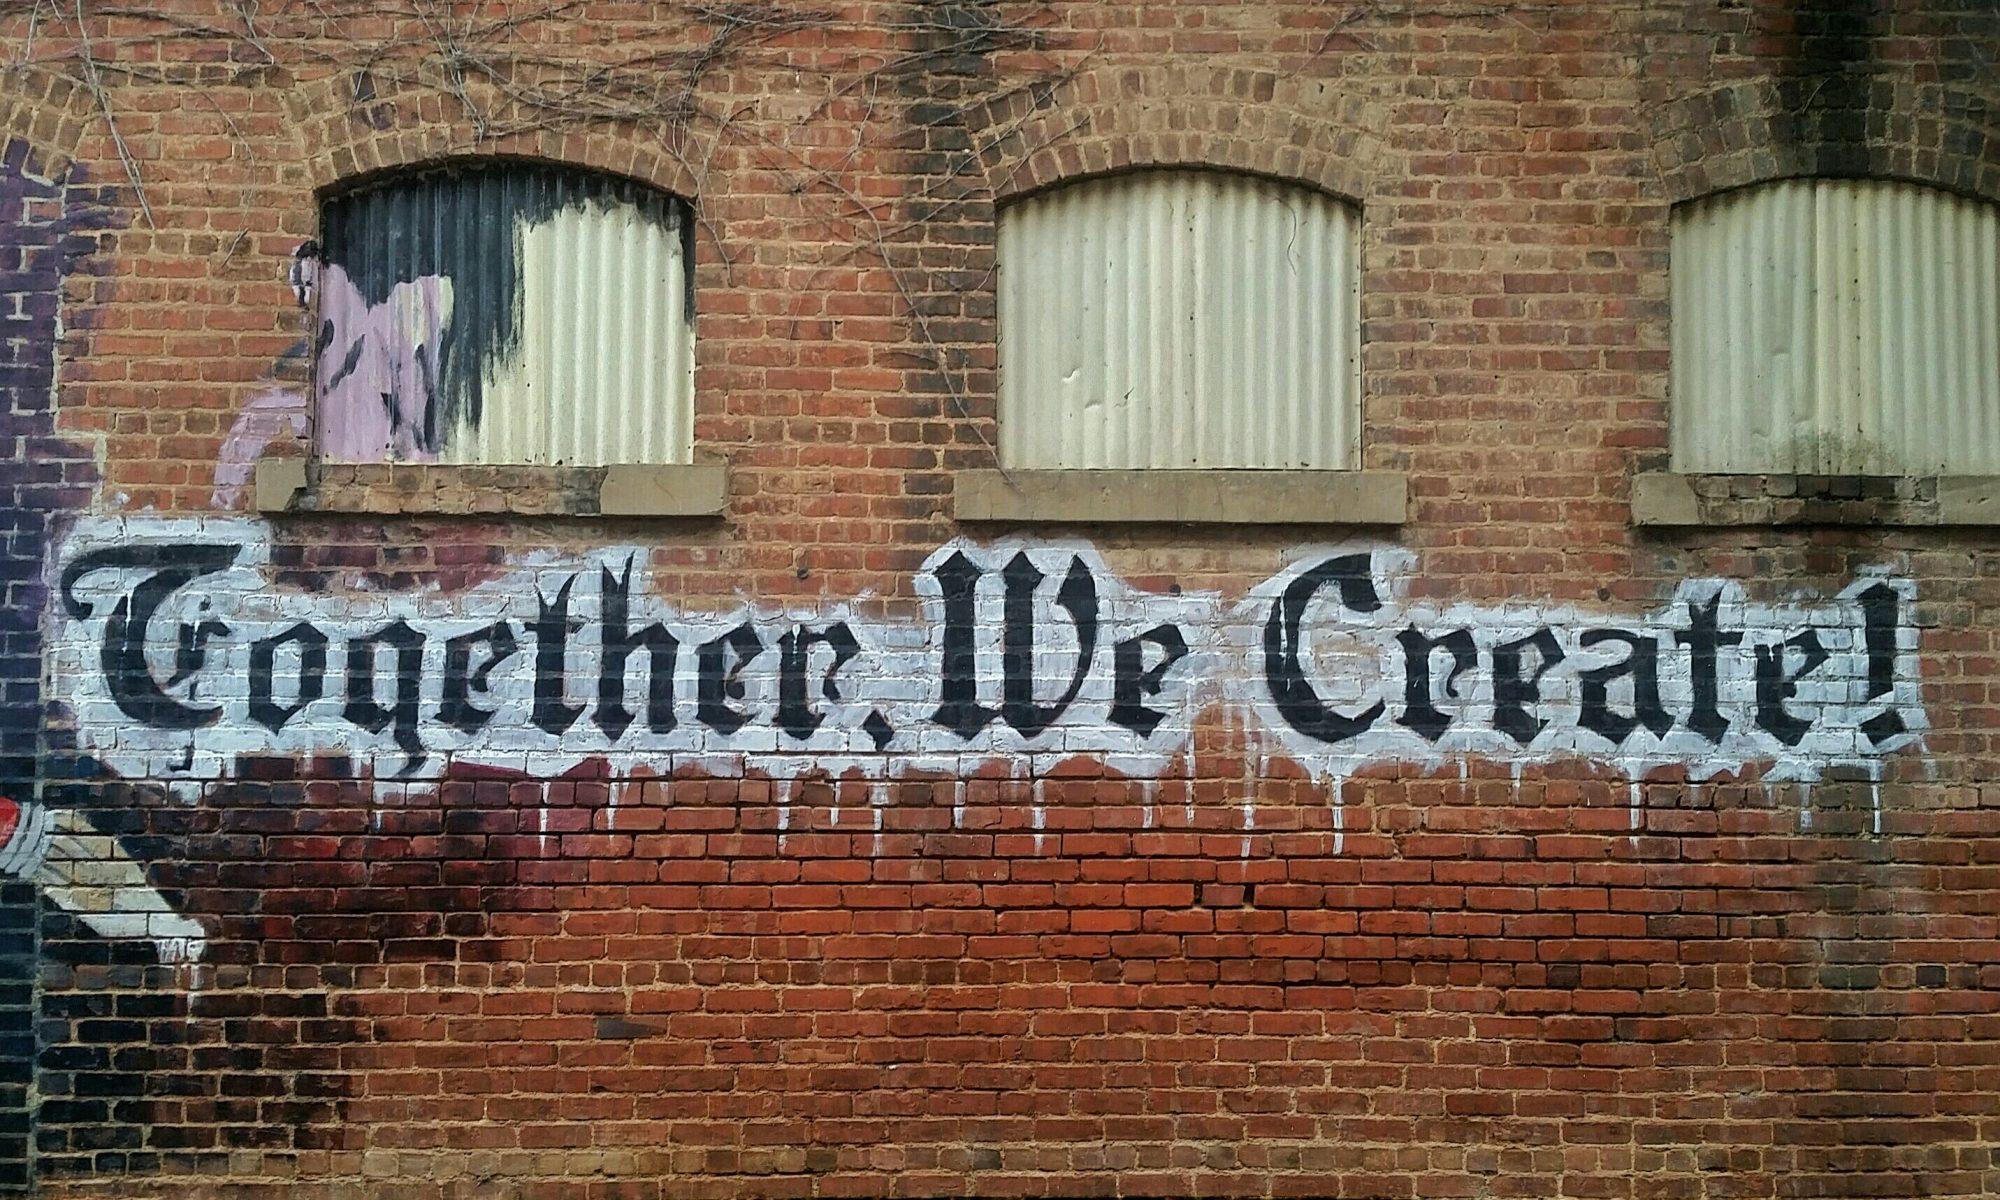 Graffiti: Together, We Create! on a brick wall